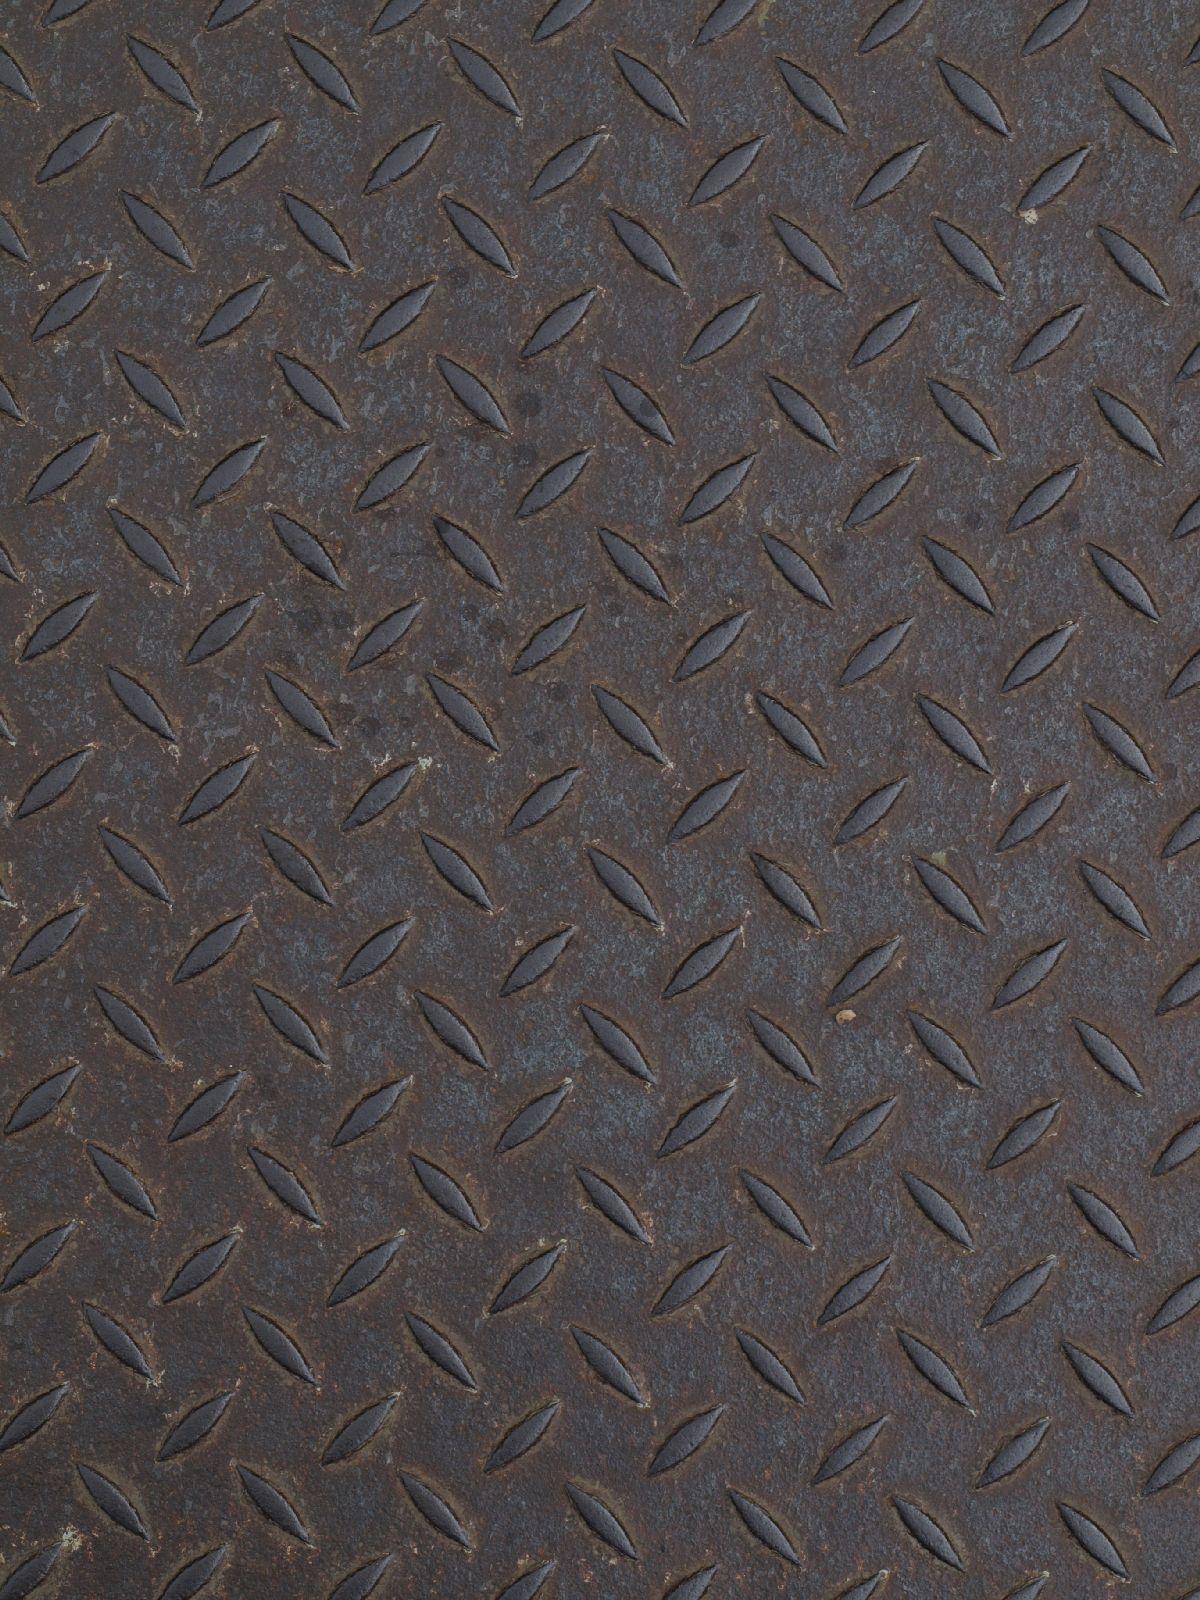 Metall_Textur_A_P4120790